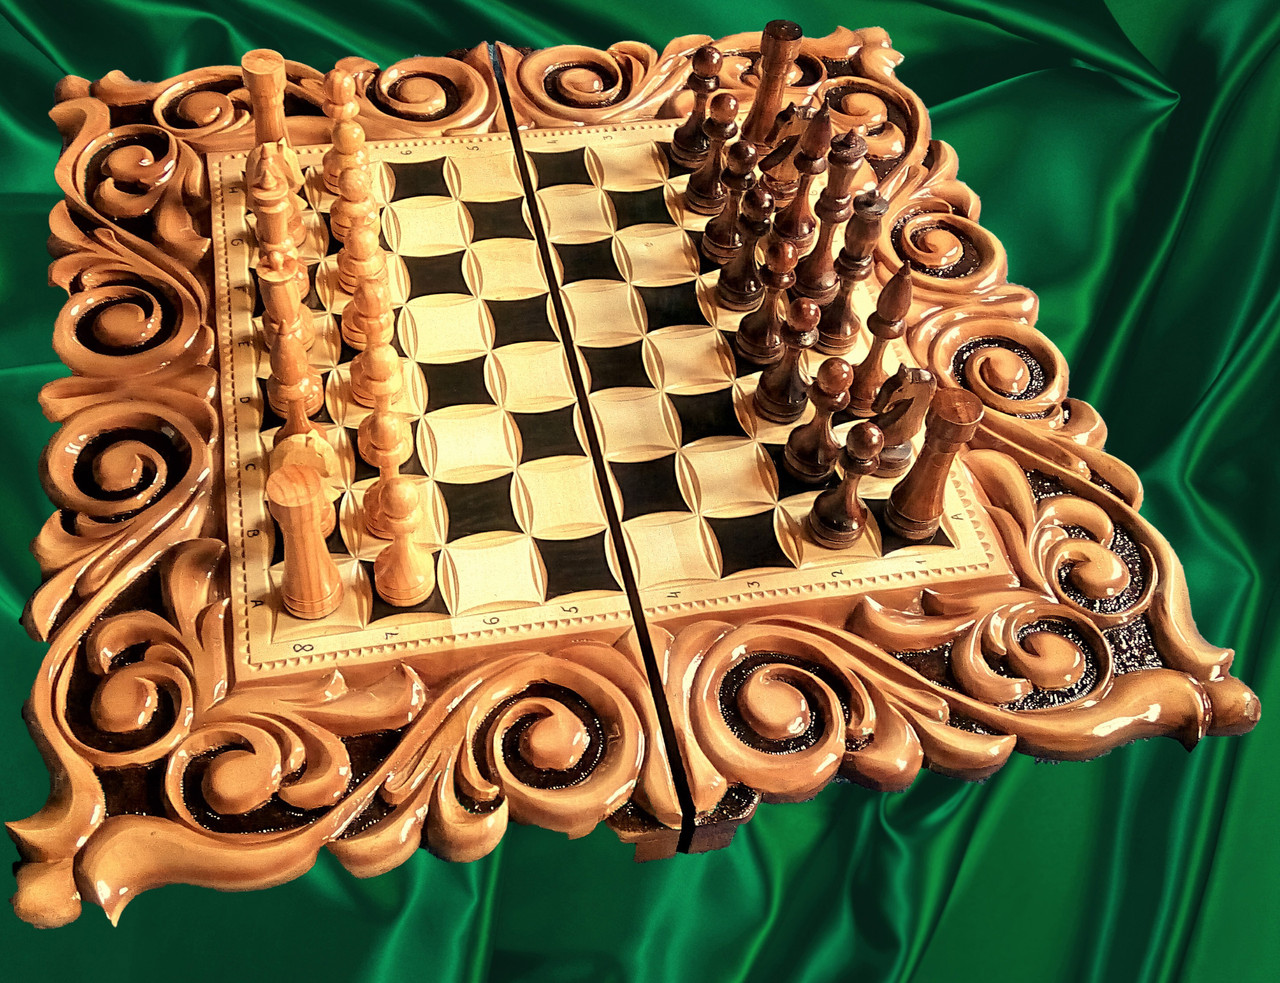 Шахматы-нарды подарочные 3 в 1